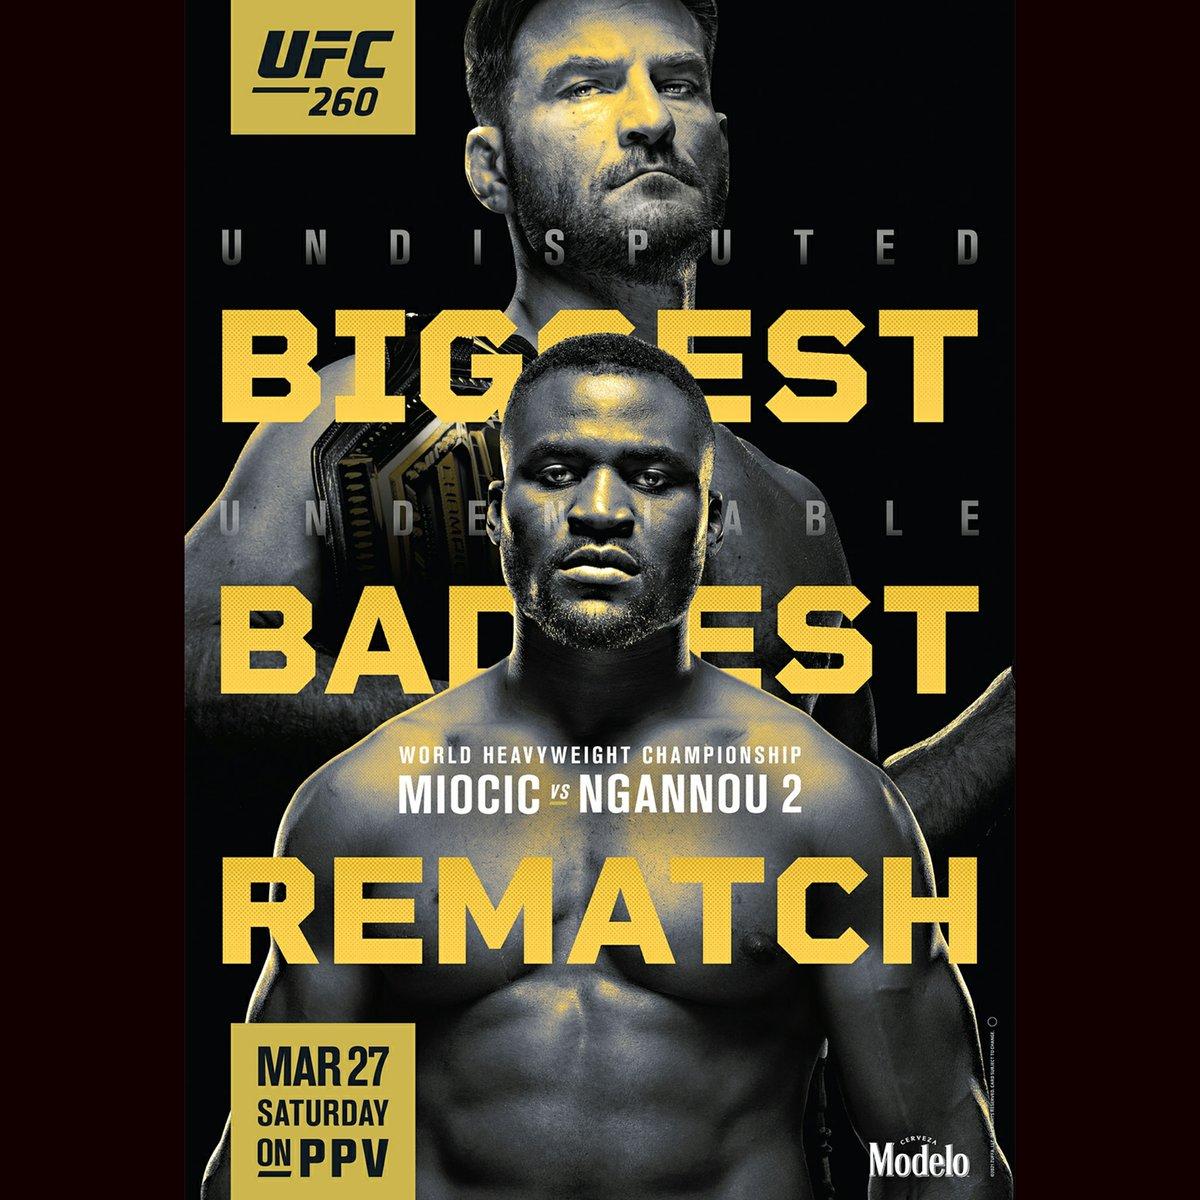 UFC 260 Poster  🇺🇲🥊 Good Luck, Stay Safe #ufc #ufcapex #ufc260 #mma #kickboxing #wrestling #bjj #jiujitsu #espn #miocicvsngannou2 #andnew #andstill